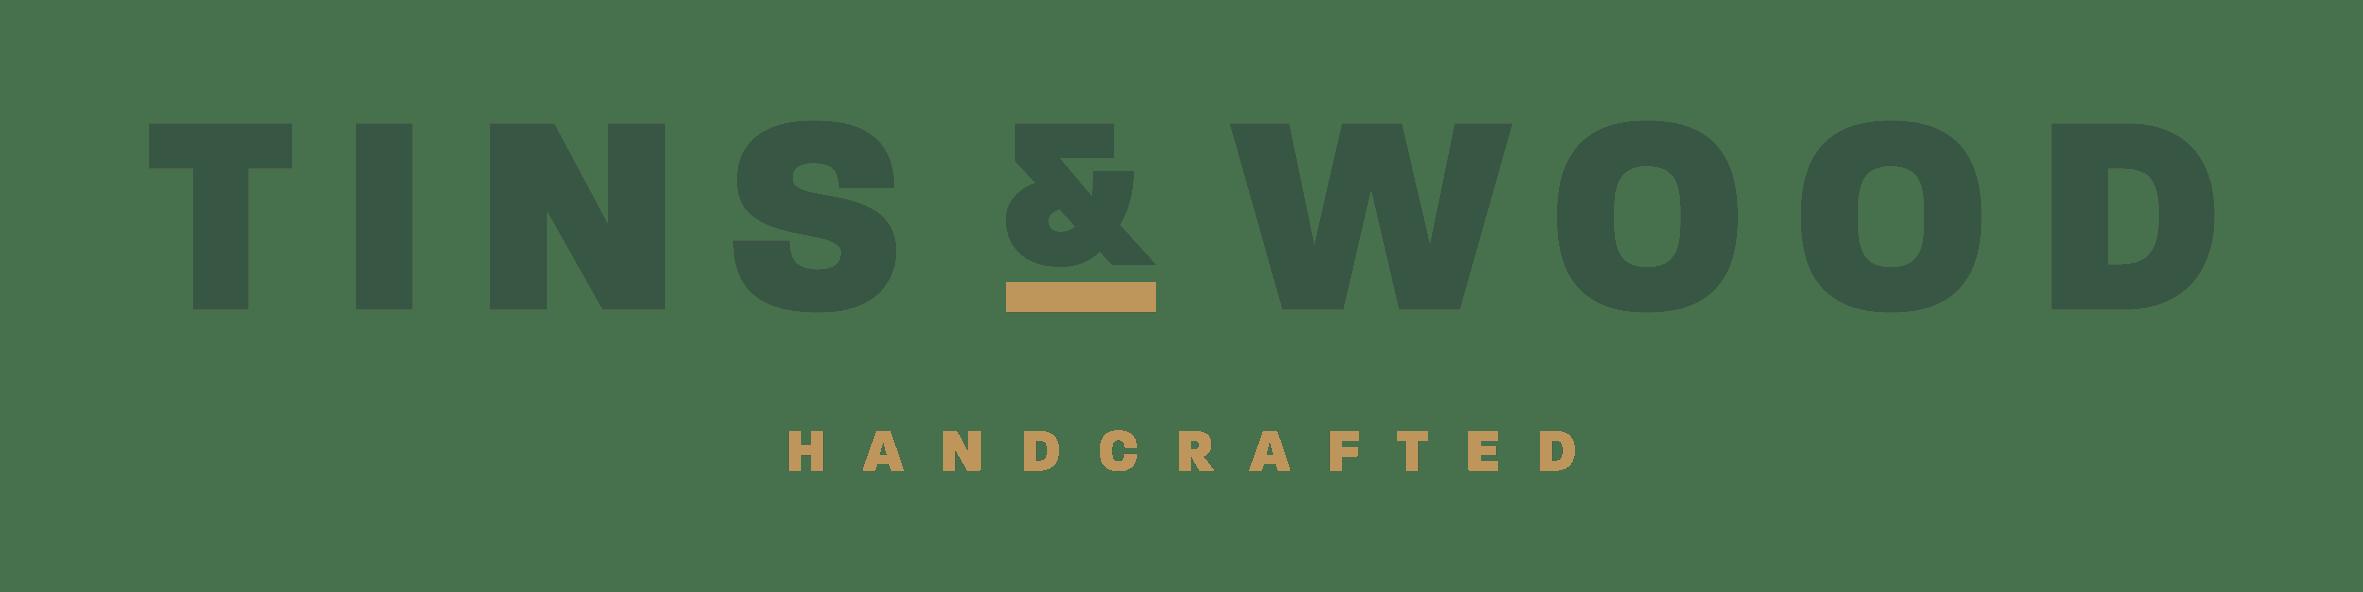 Tins & Wood